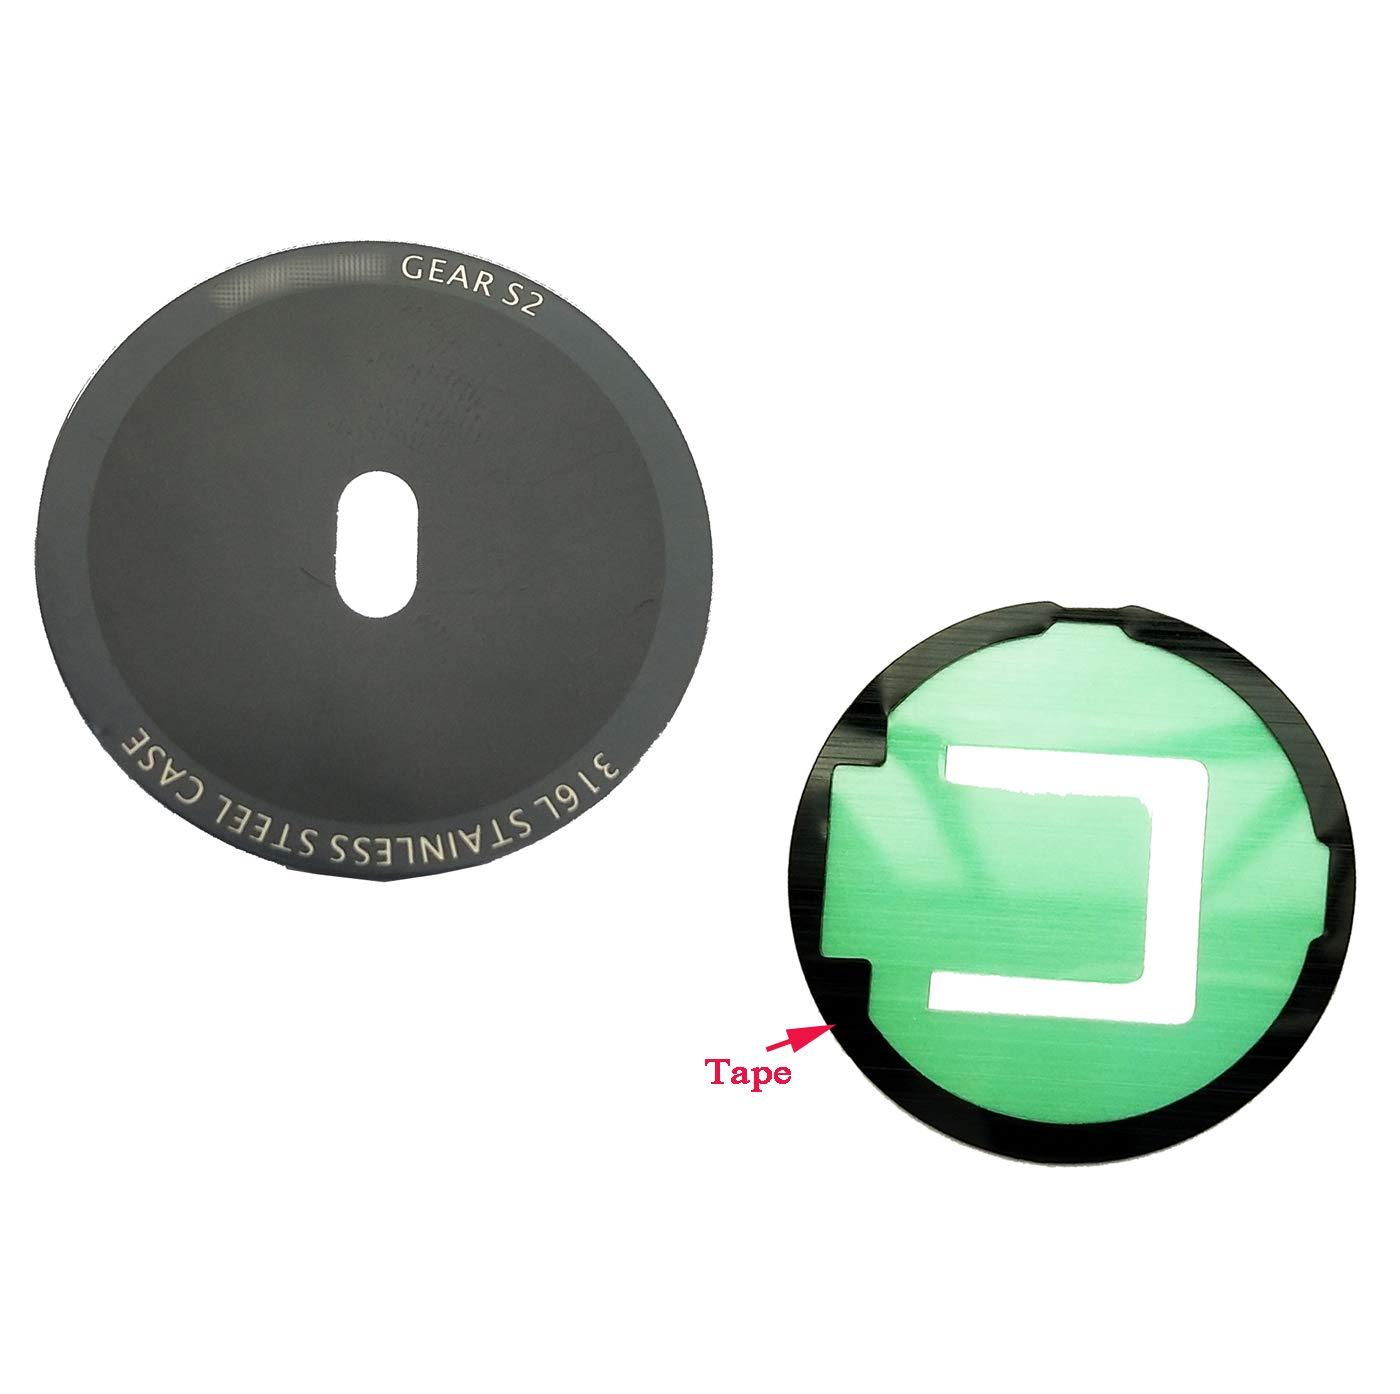 Repuesto Tapa Trasera Samsung Gear S2 Sm-r720 Sm-r730